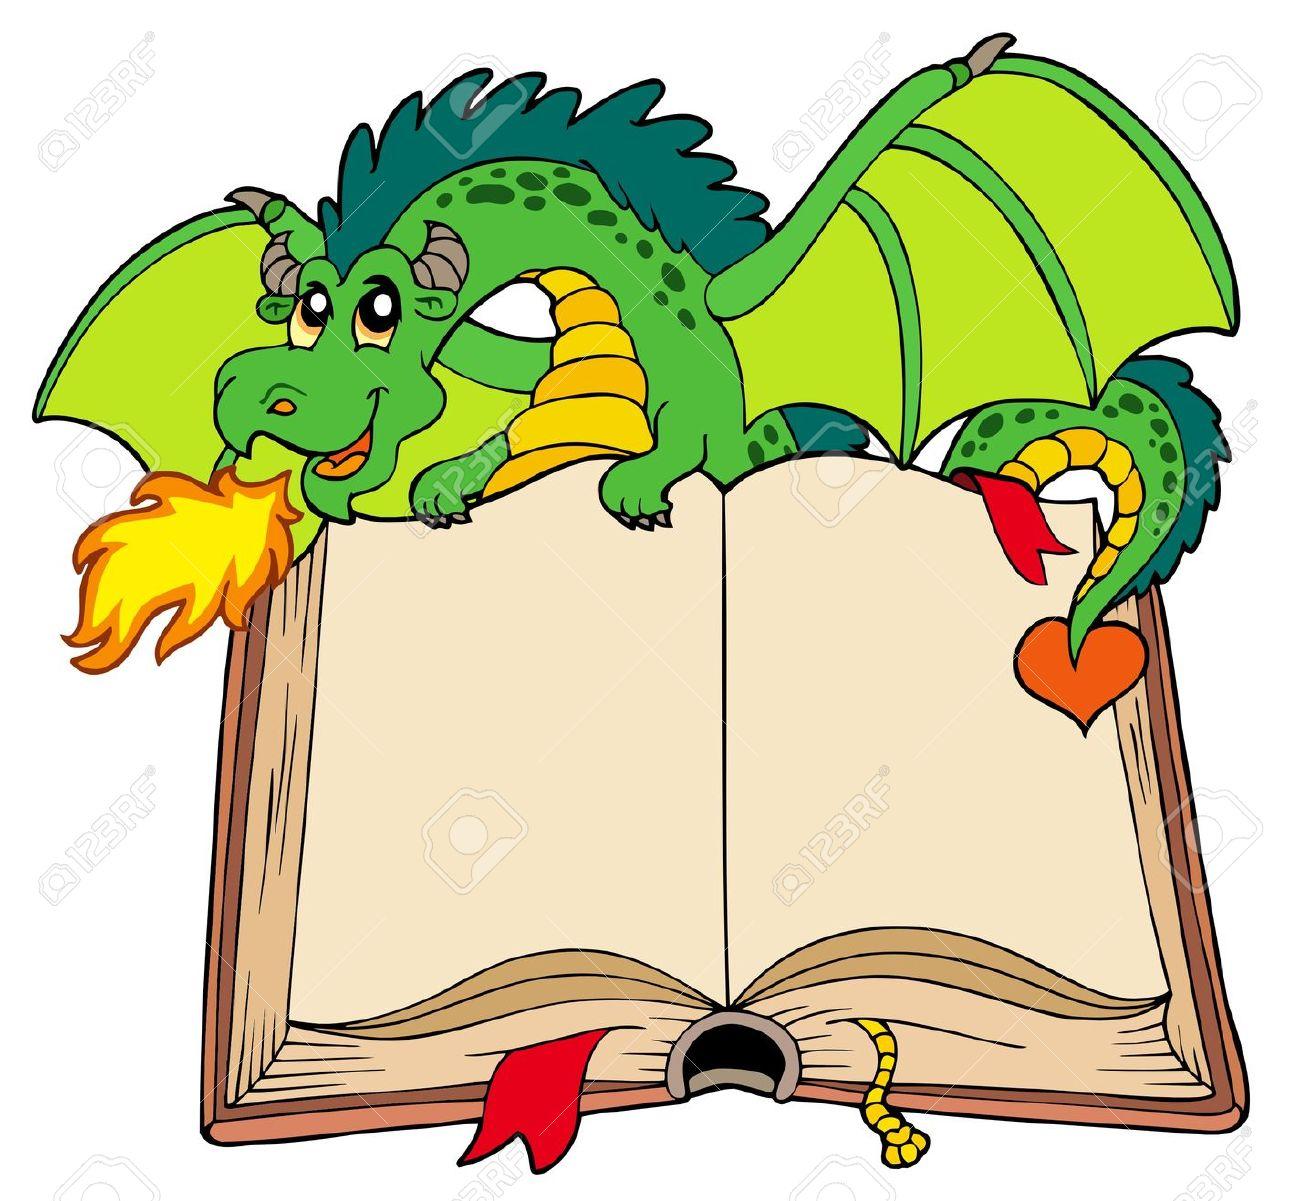 Fairy tale book free. Fairytale clipart fantasy story